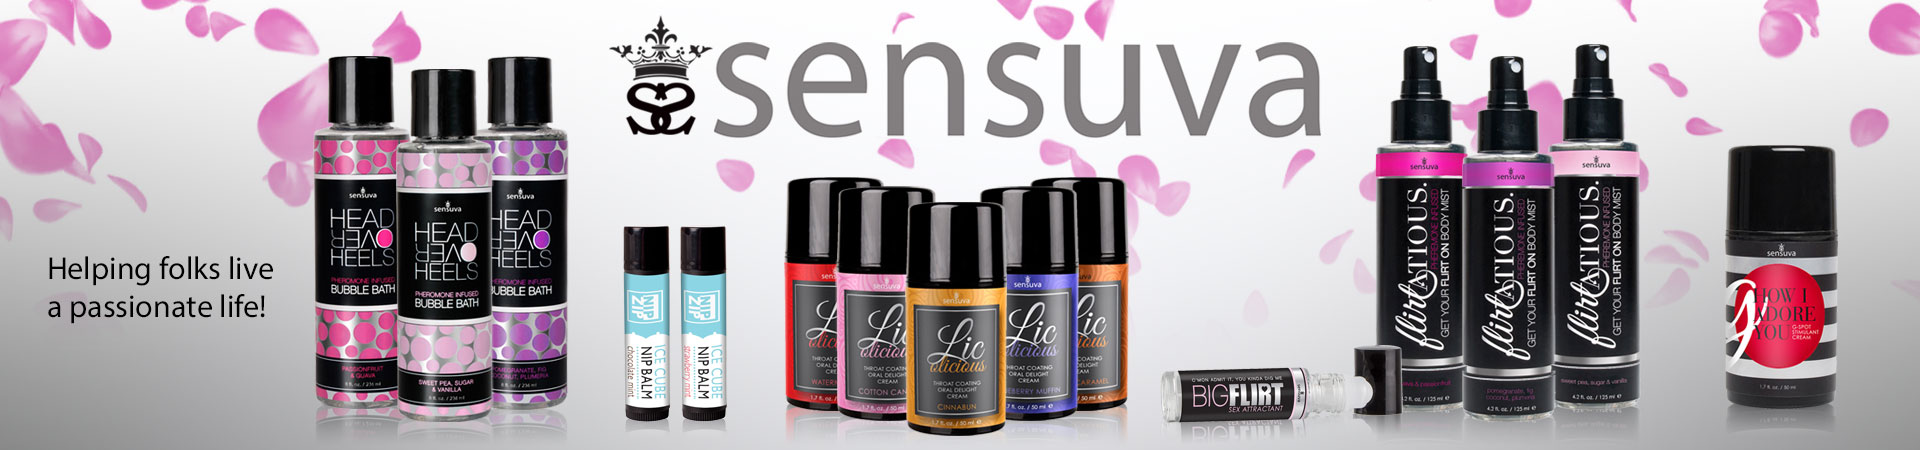 SENSUVA - Helping folks live a passionate life